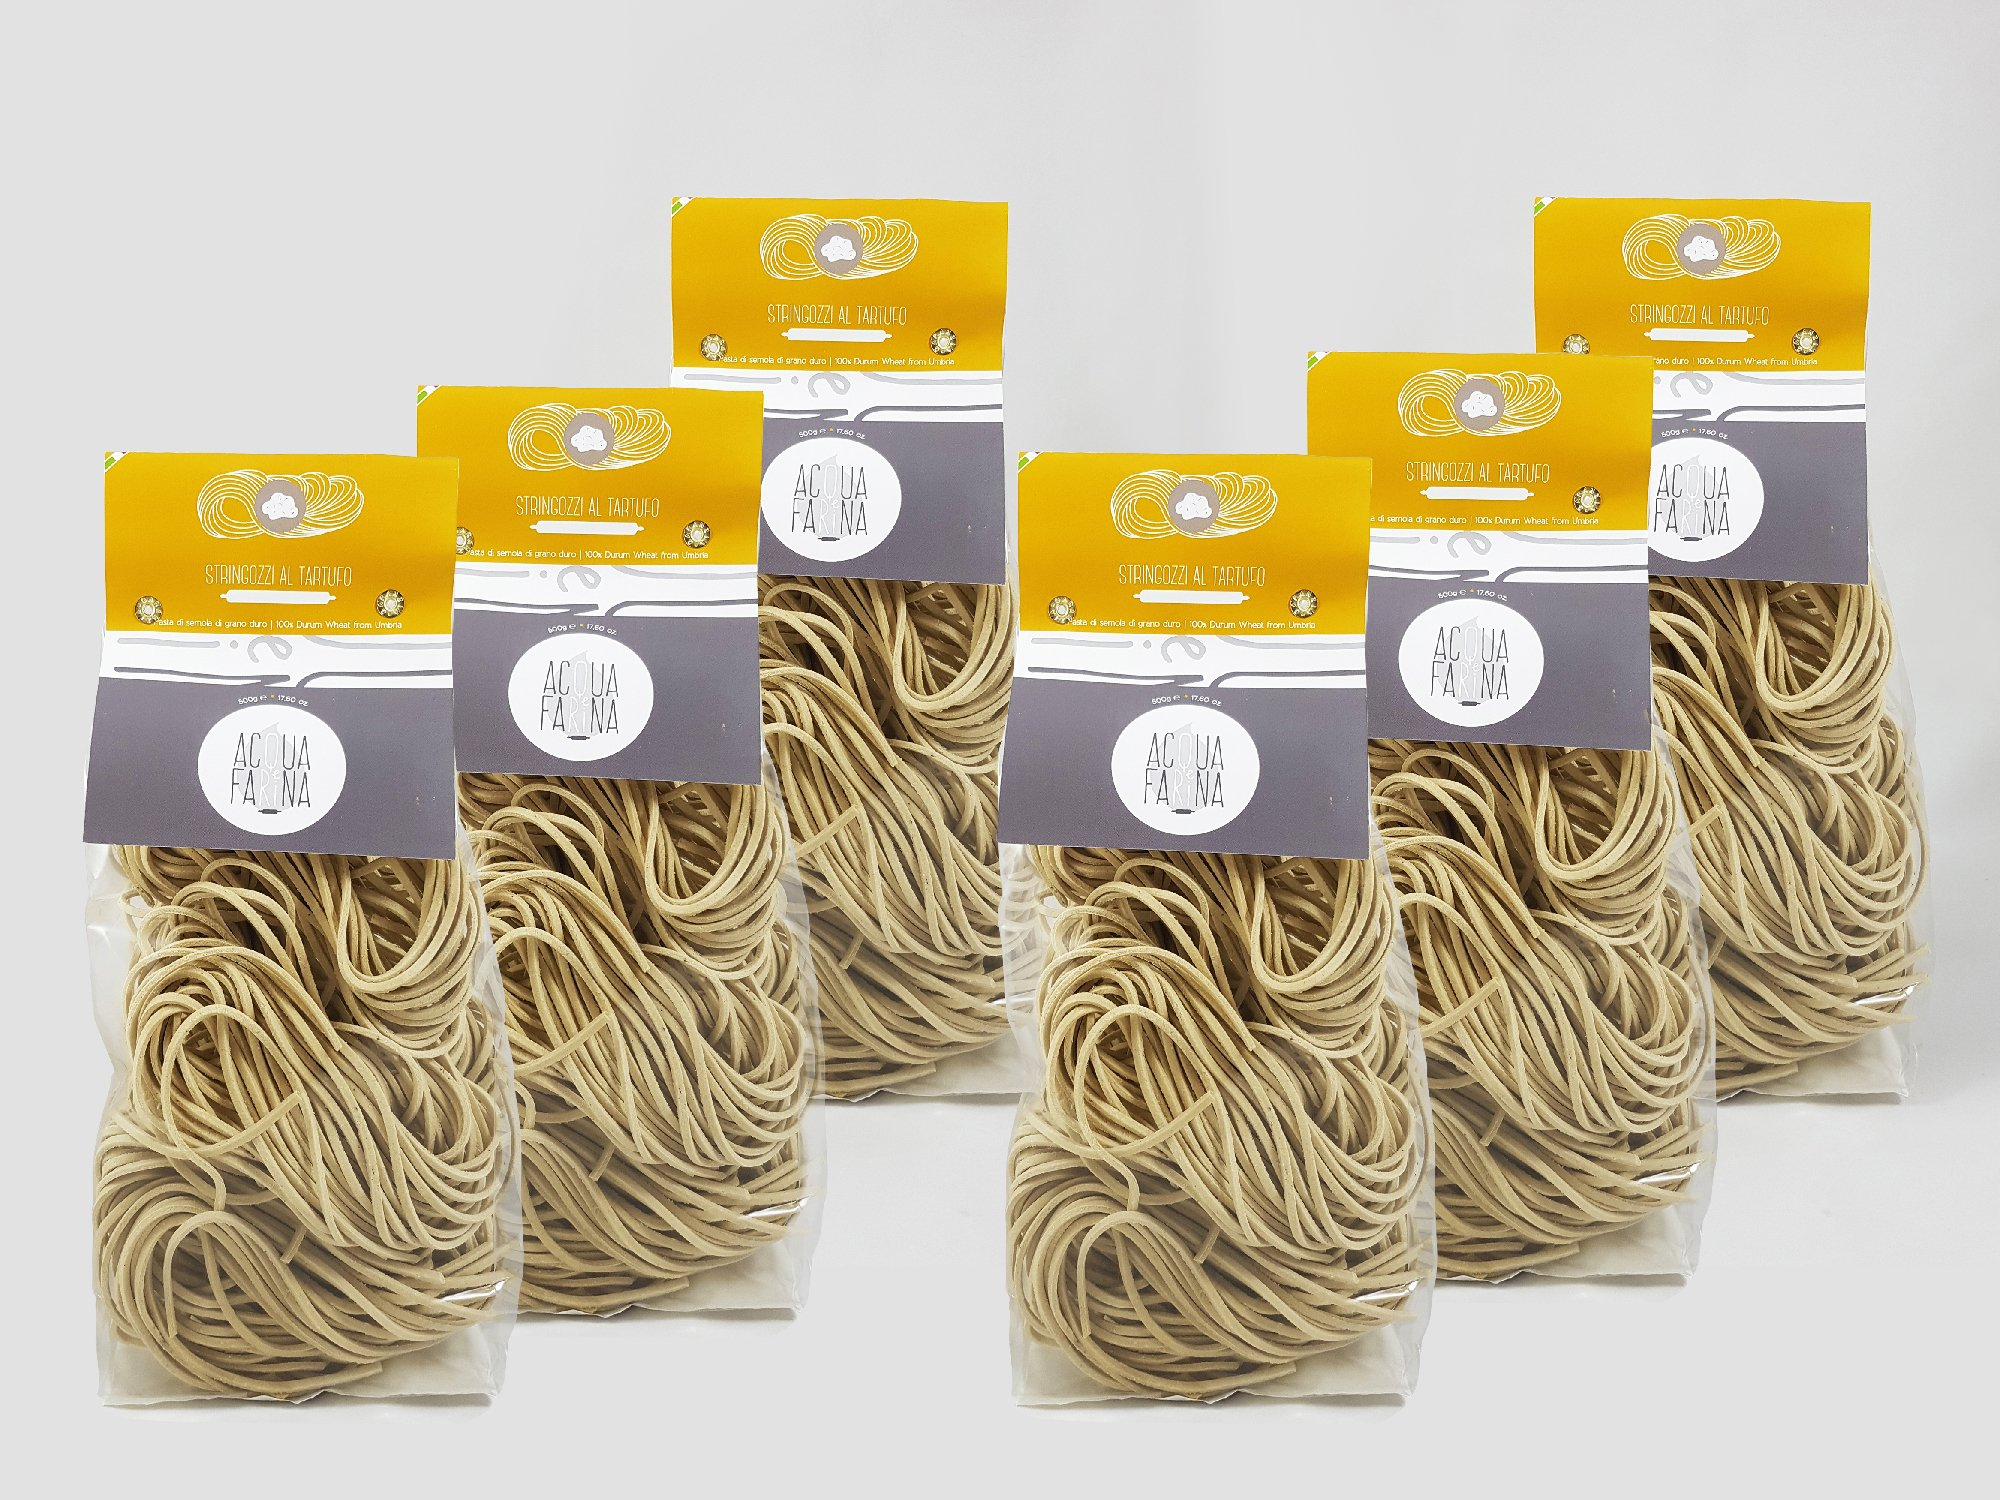 Stringozzi al tartufo 17.60 oz pack of 6 Truffle Flavor